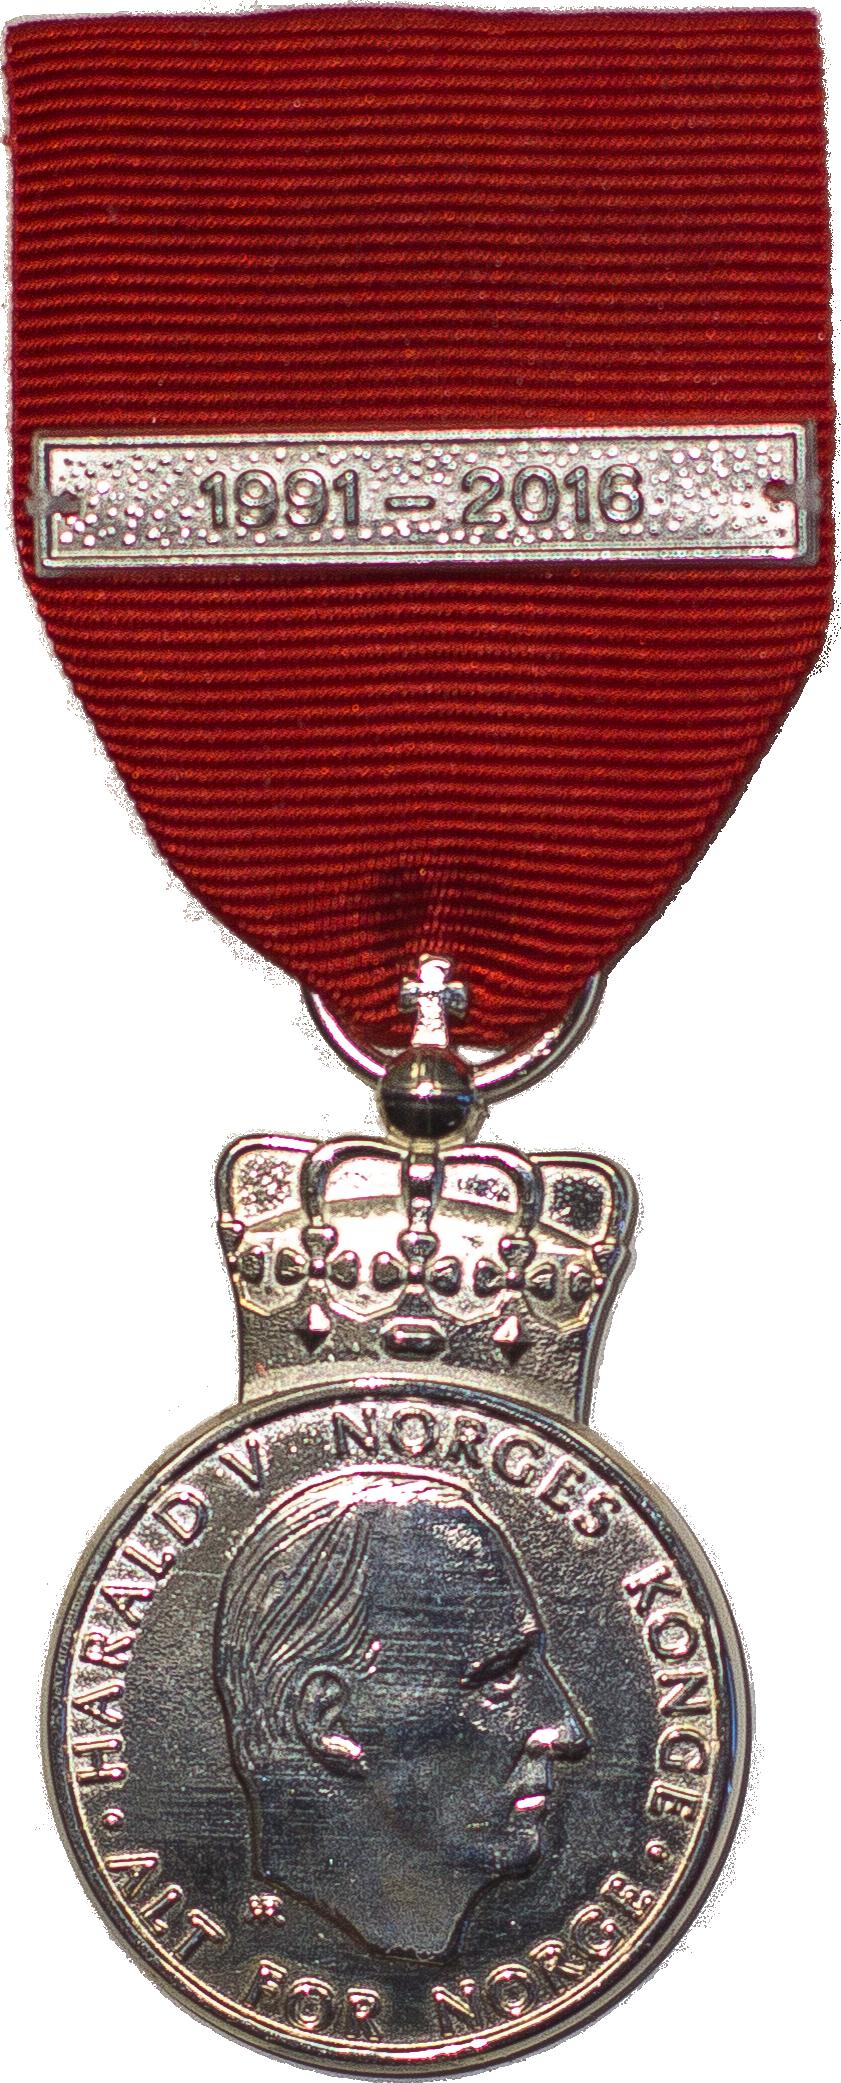 kong harald vs jubileumsmedalje 1991 u20132016  u2013 wikipedia